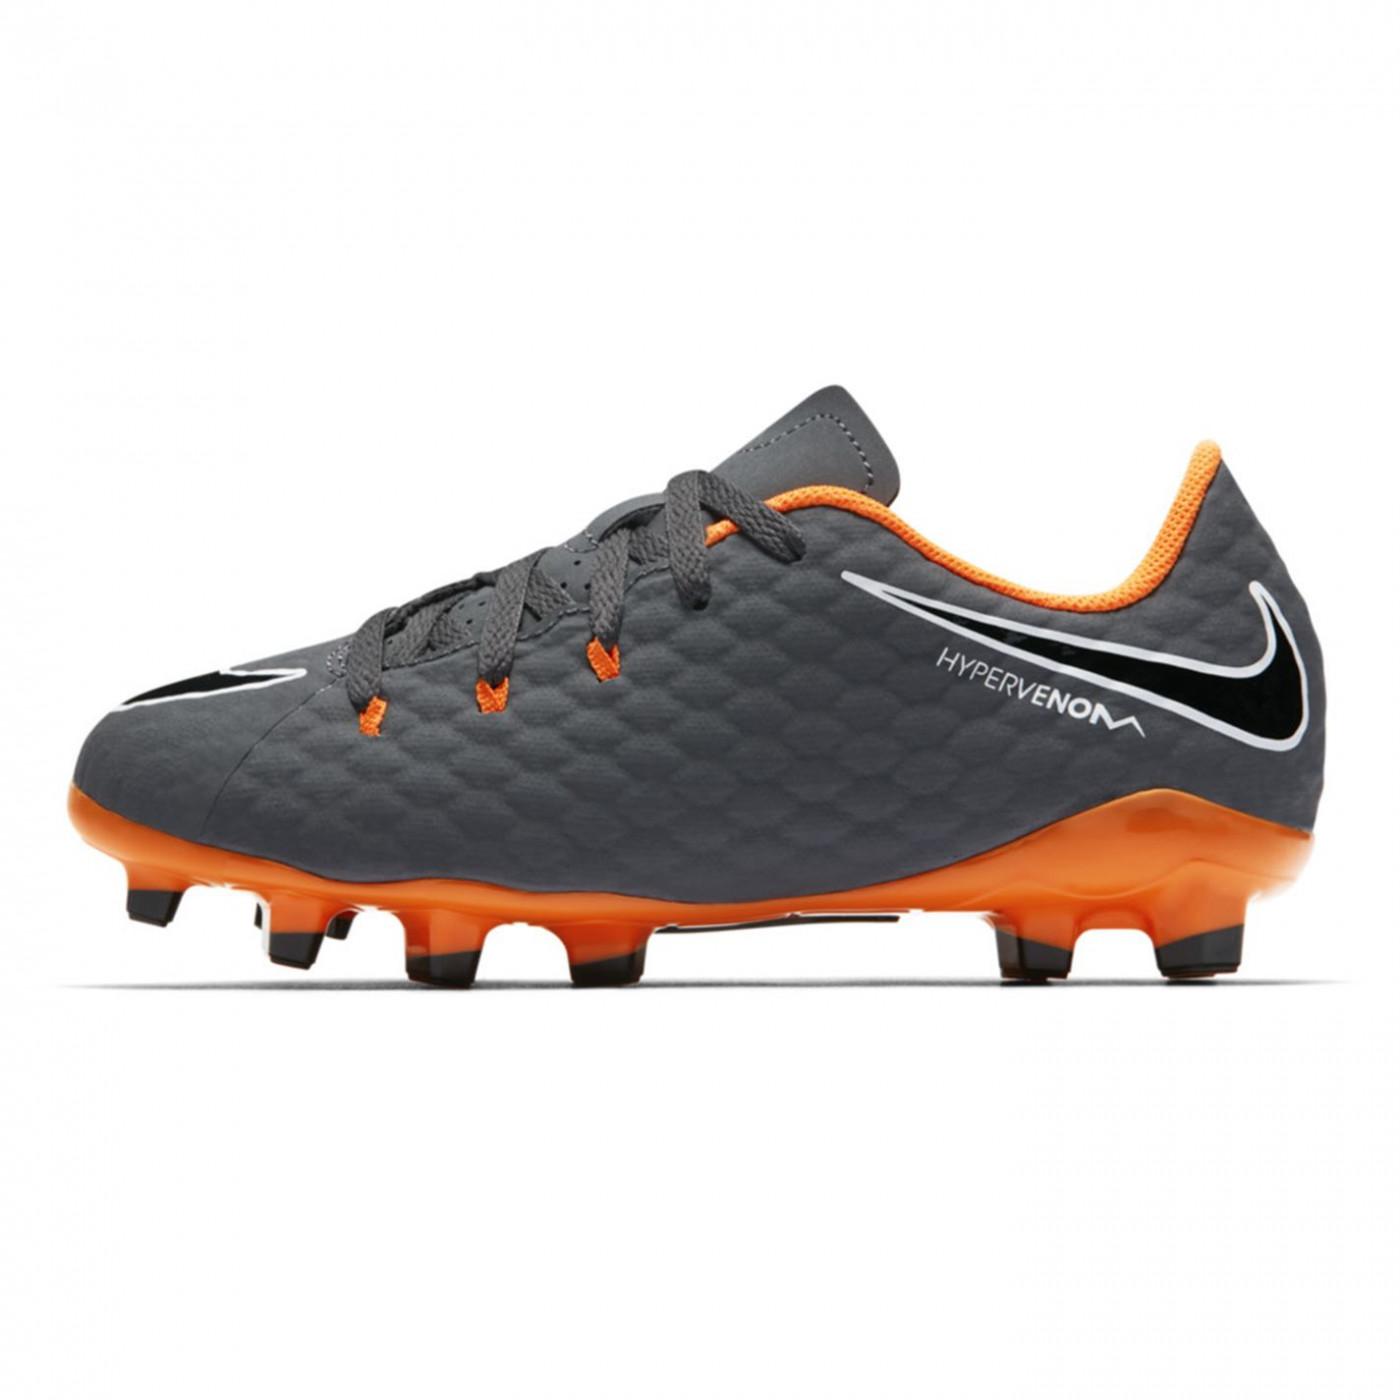 fe28fe652 Nike Hypervenom Phantom Academy Junior FG Football Boots - FACTCOOL